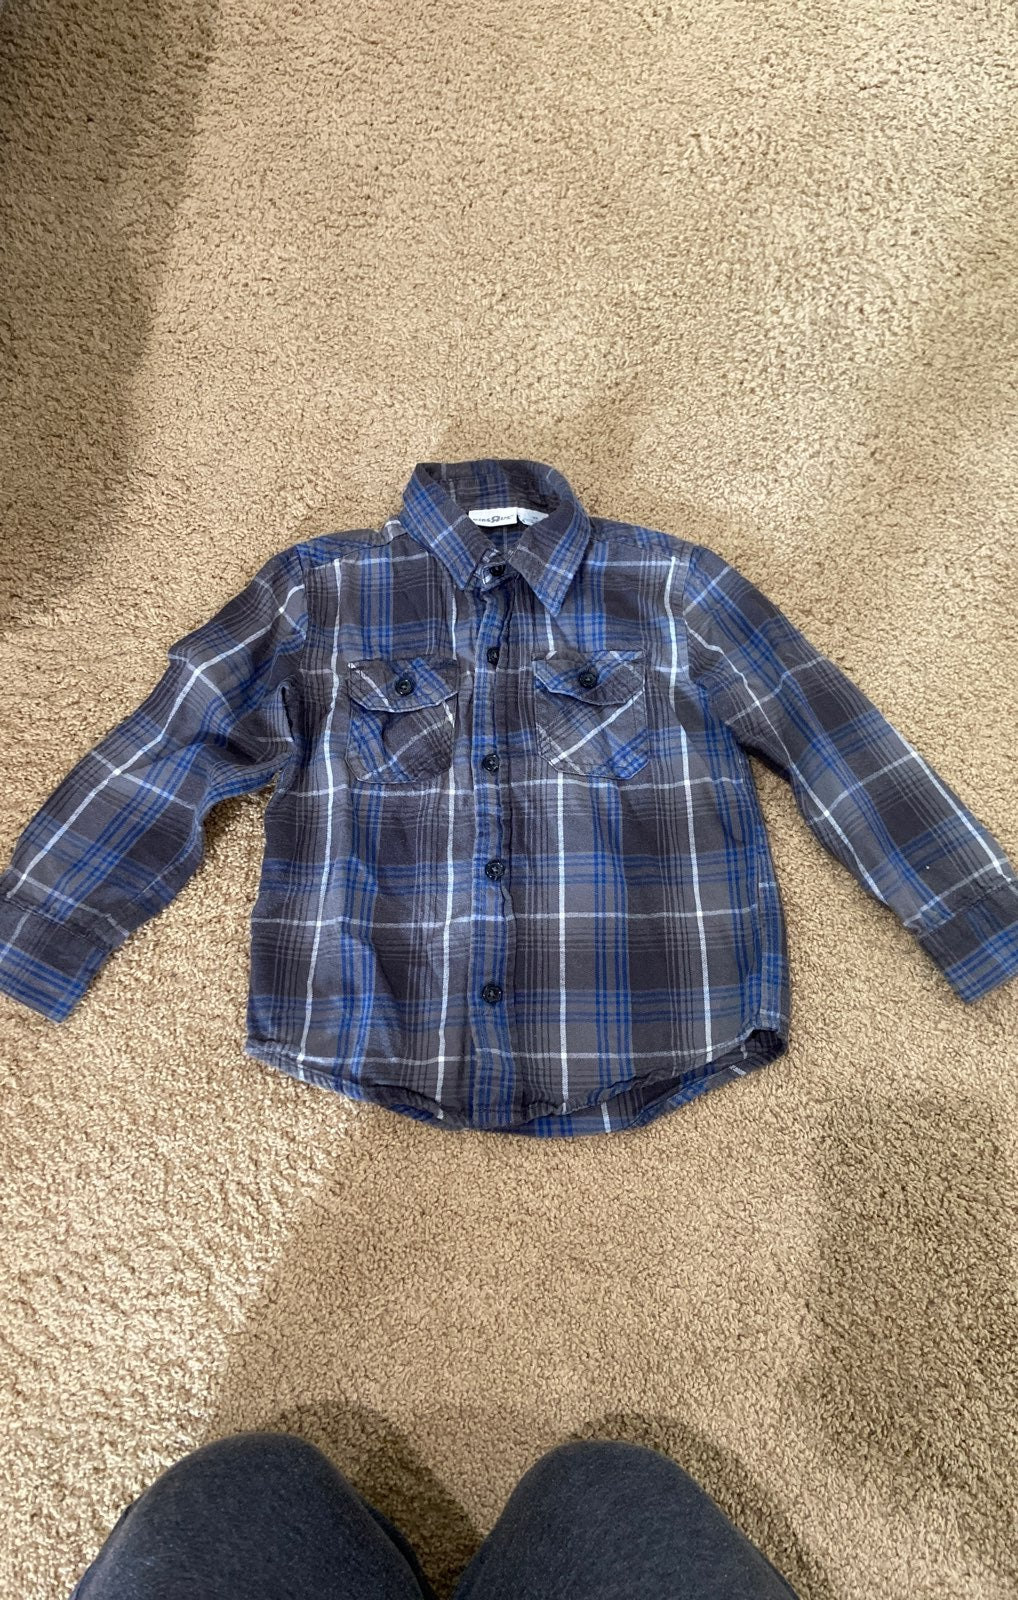 Boys 3t Plaid Flannel long Sleeve Shirt